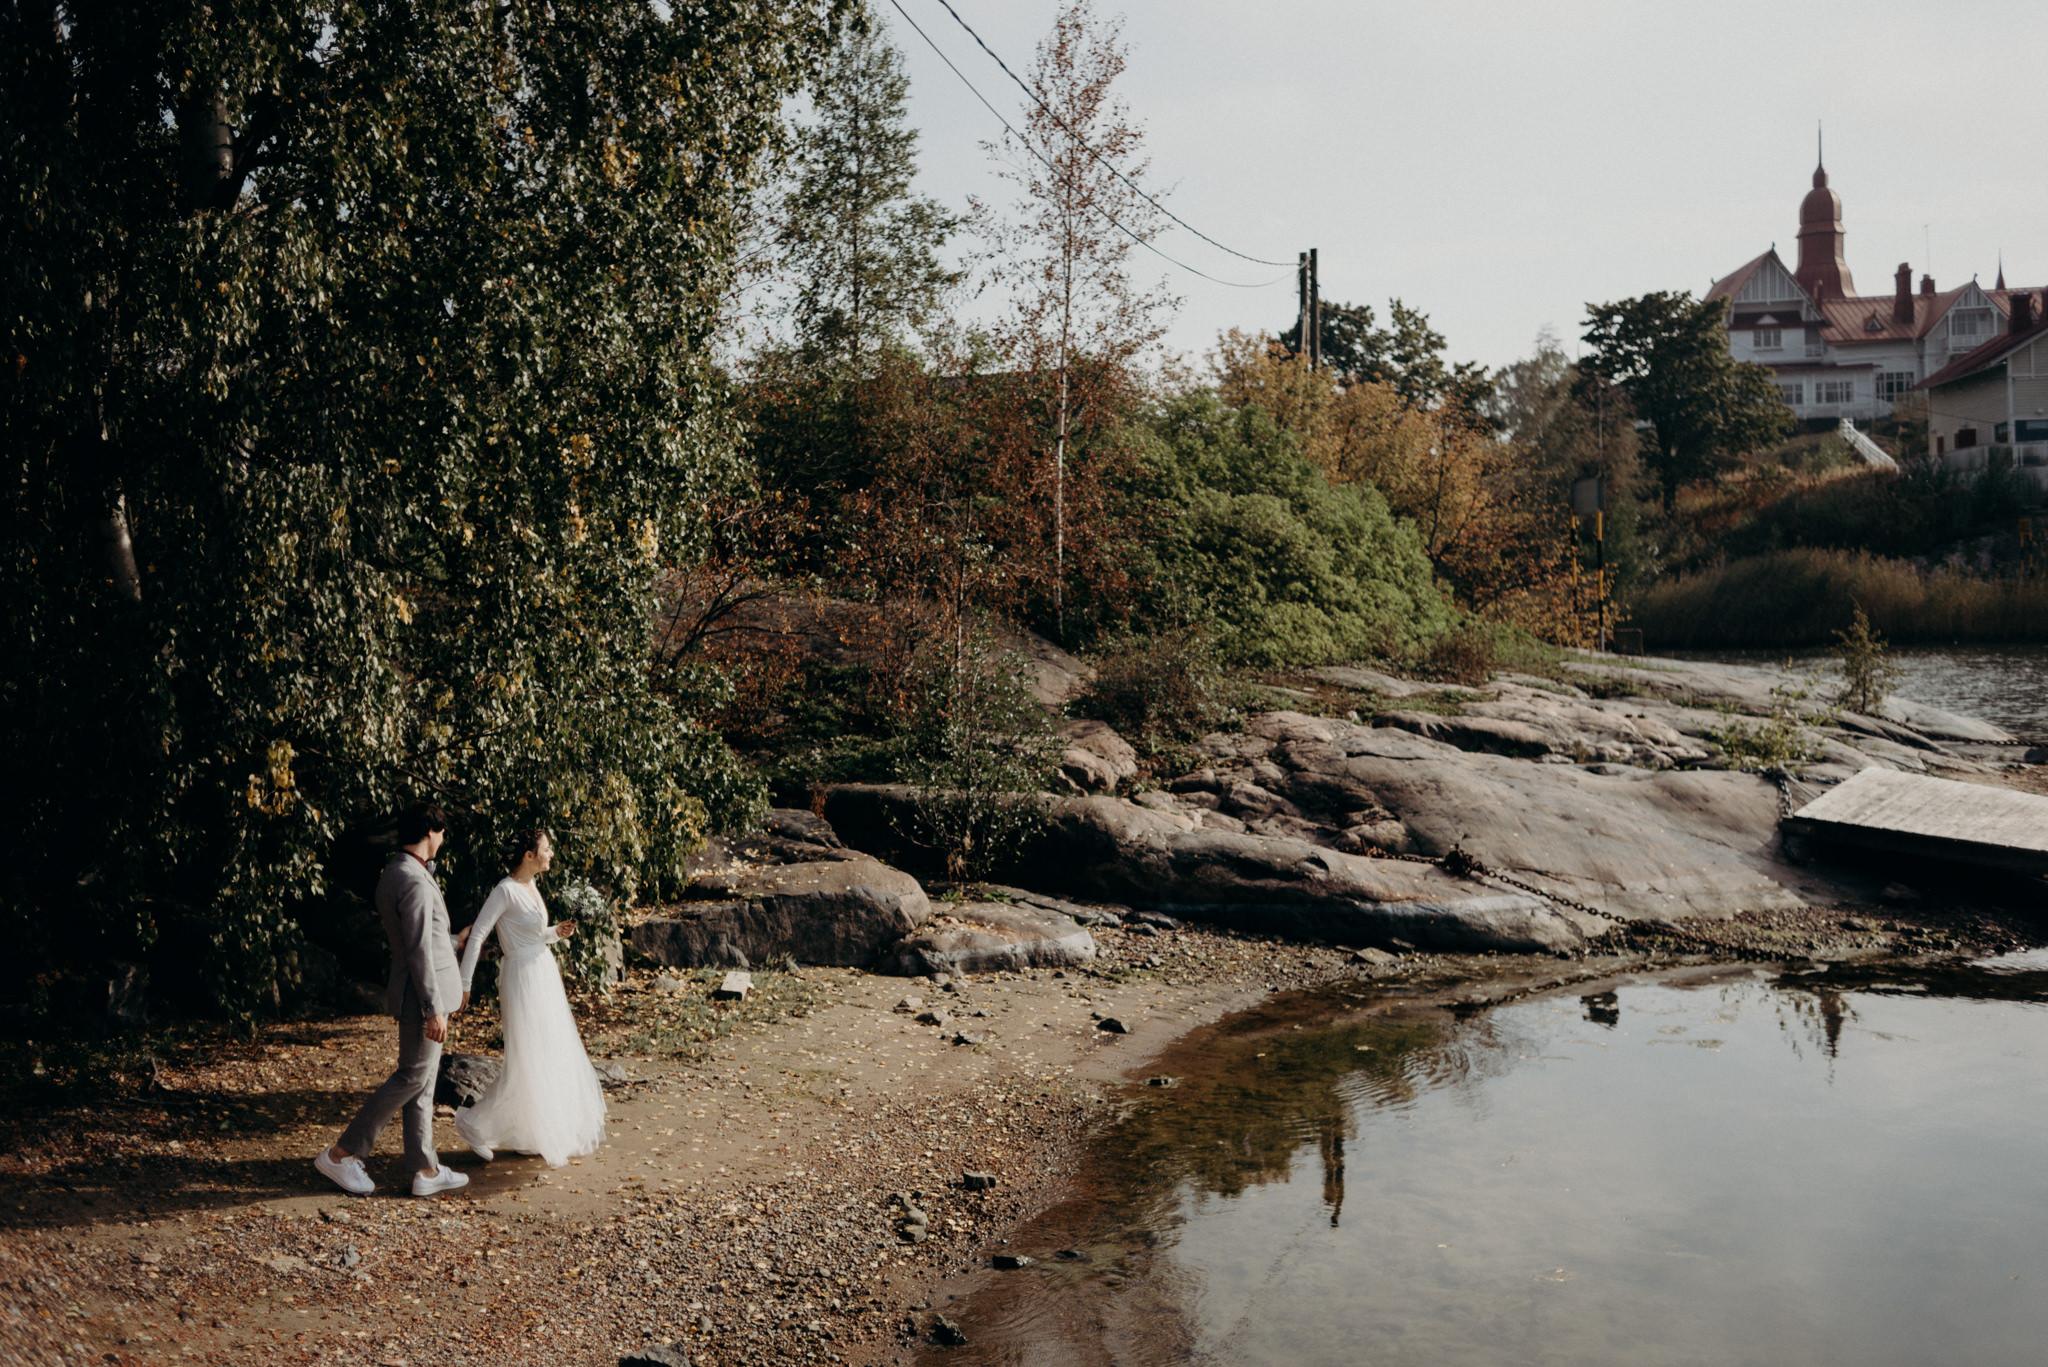 bride and groom standing by water, Helsinki wedding portraits